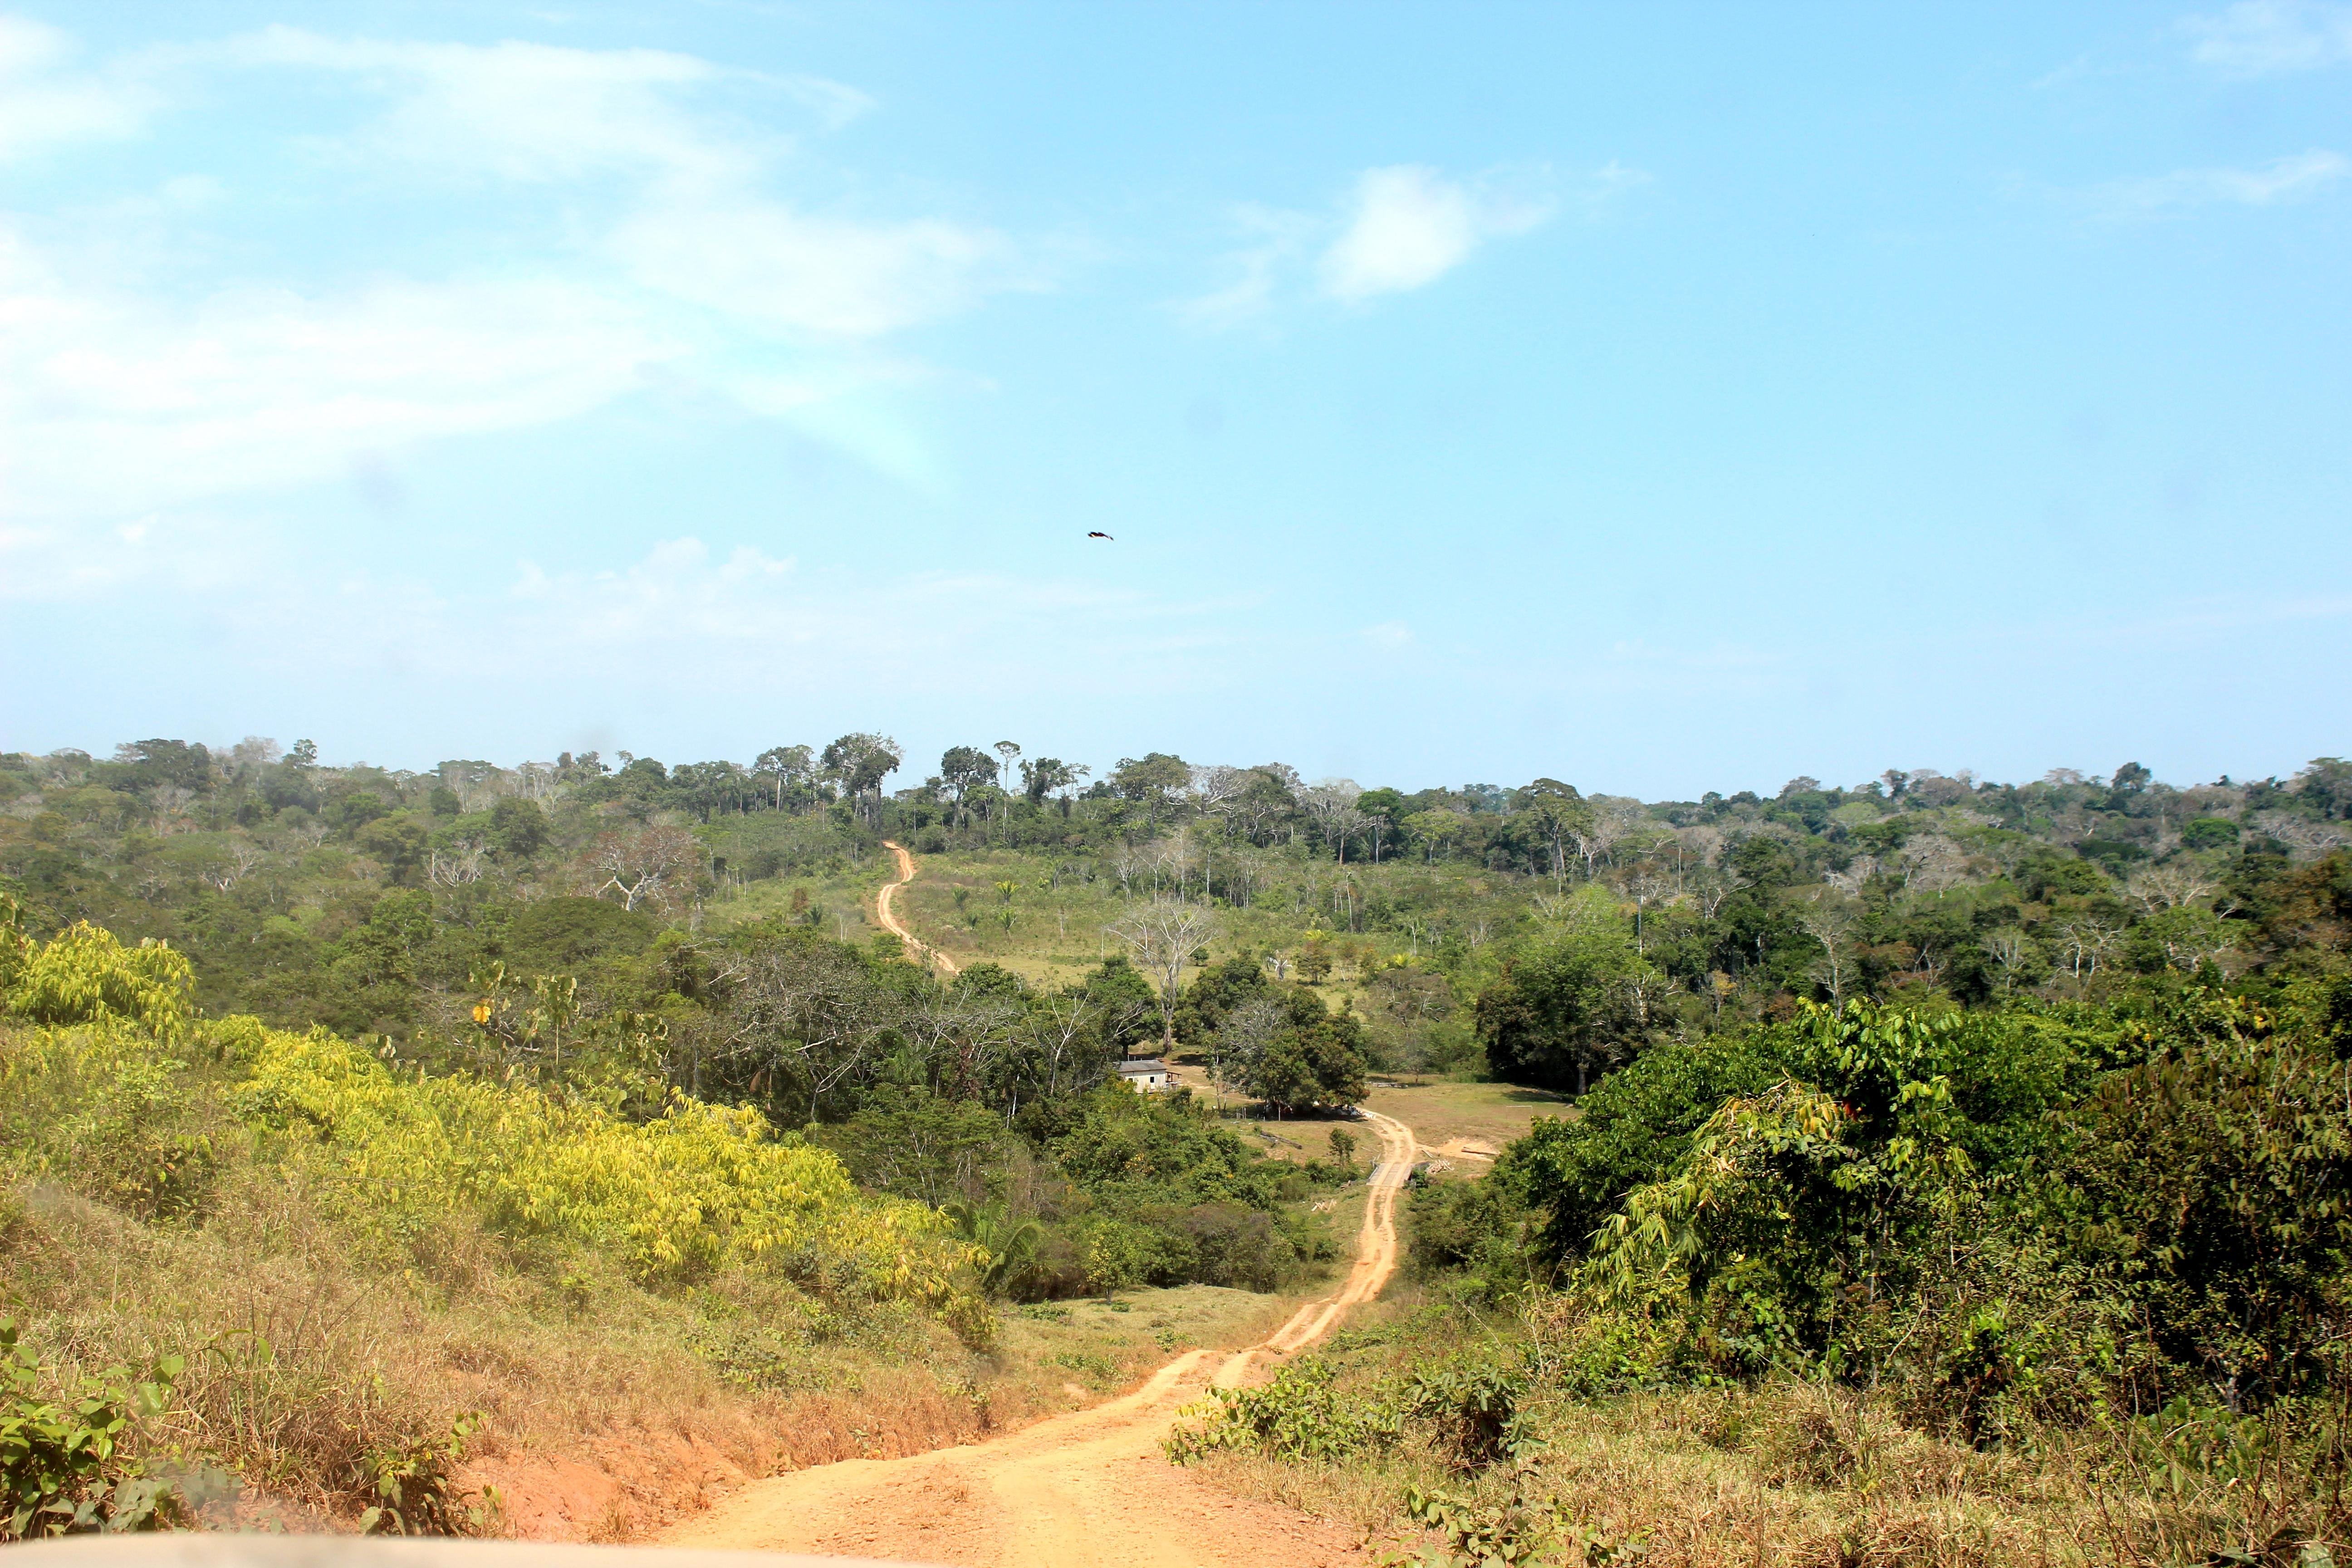 Reserva Extrativista Chico Mendes, Acre. Foto: Nanda Melonio/Flickr.